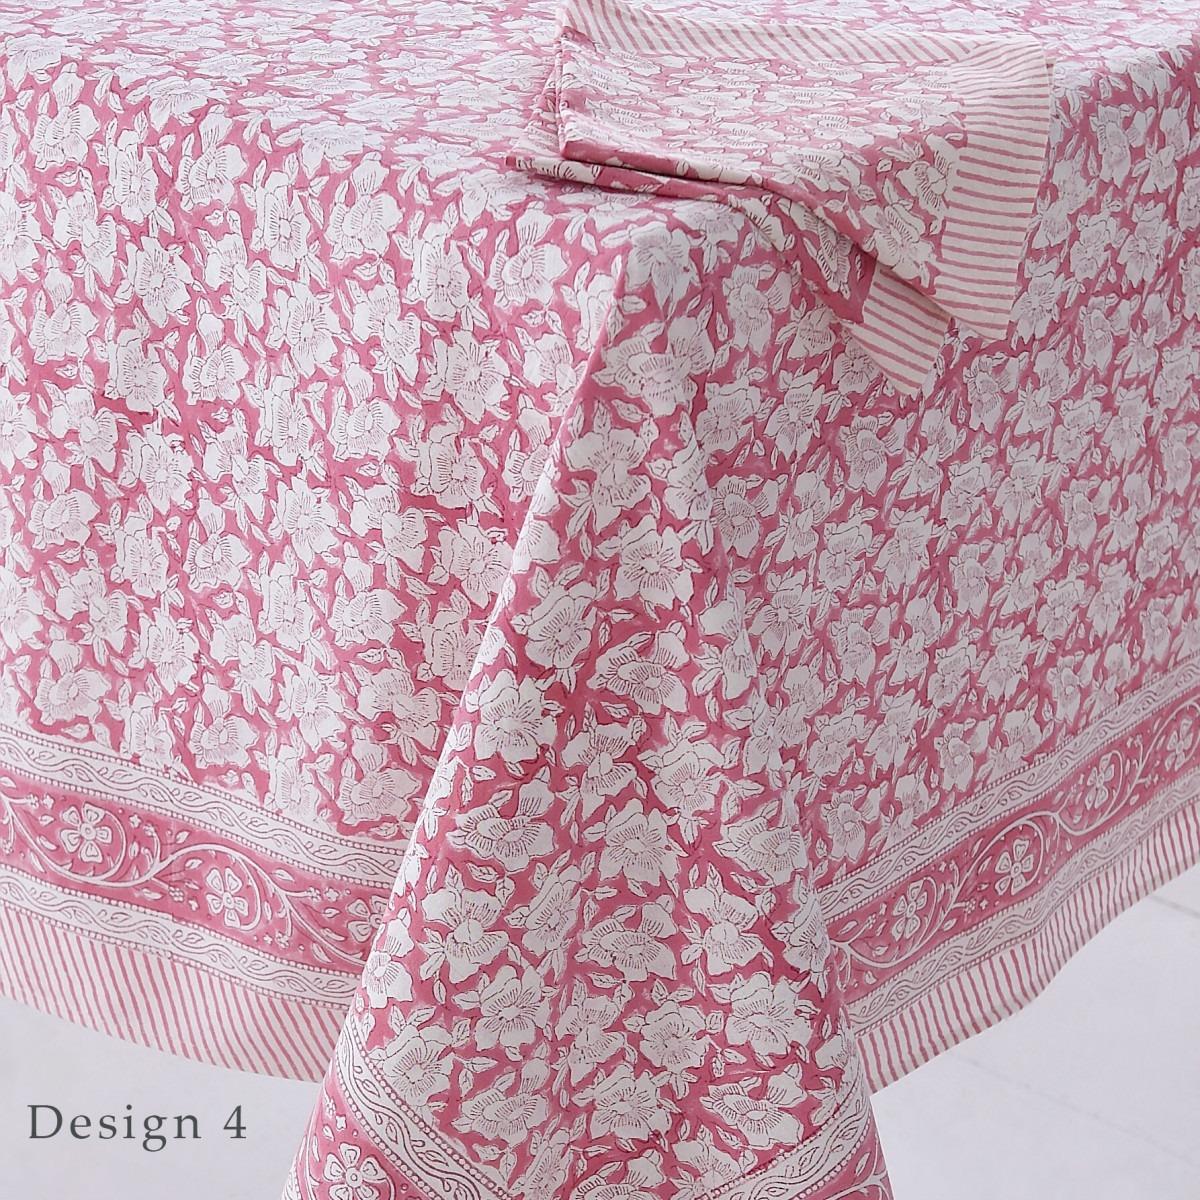 Block Printed Tablecloth Design 4